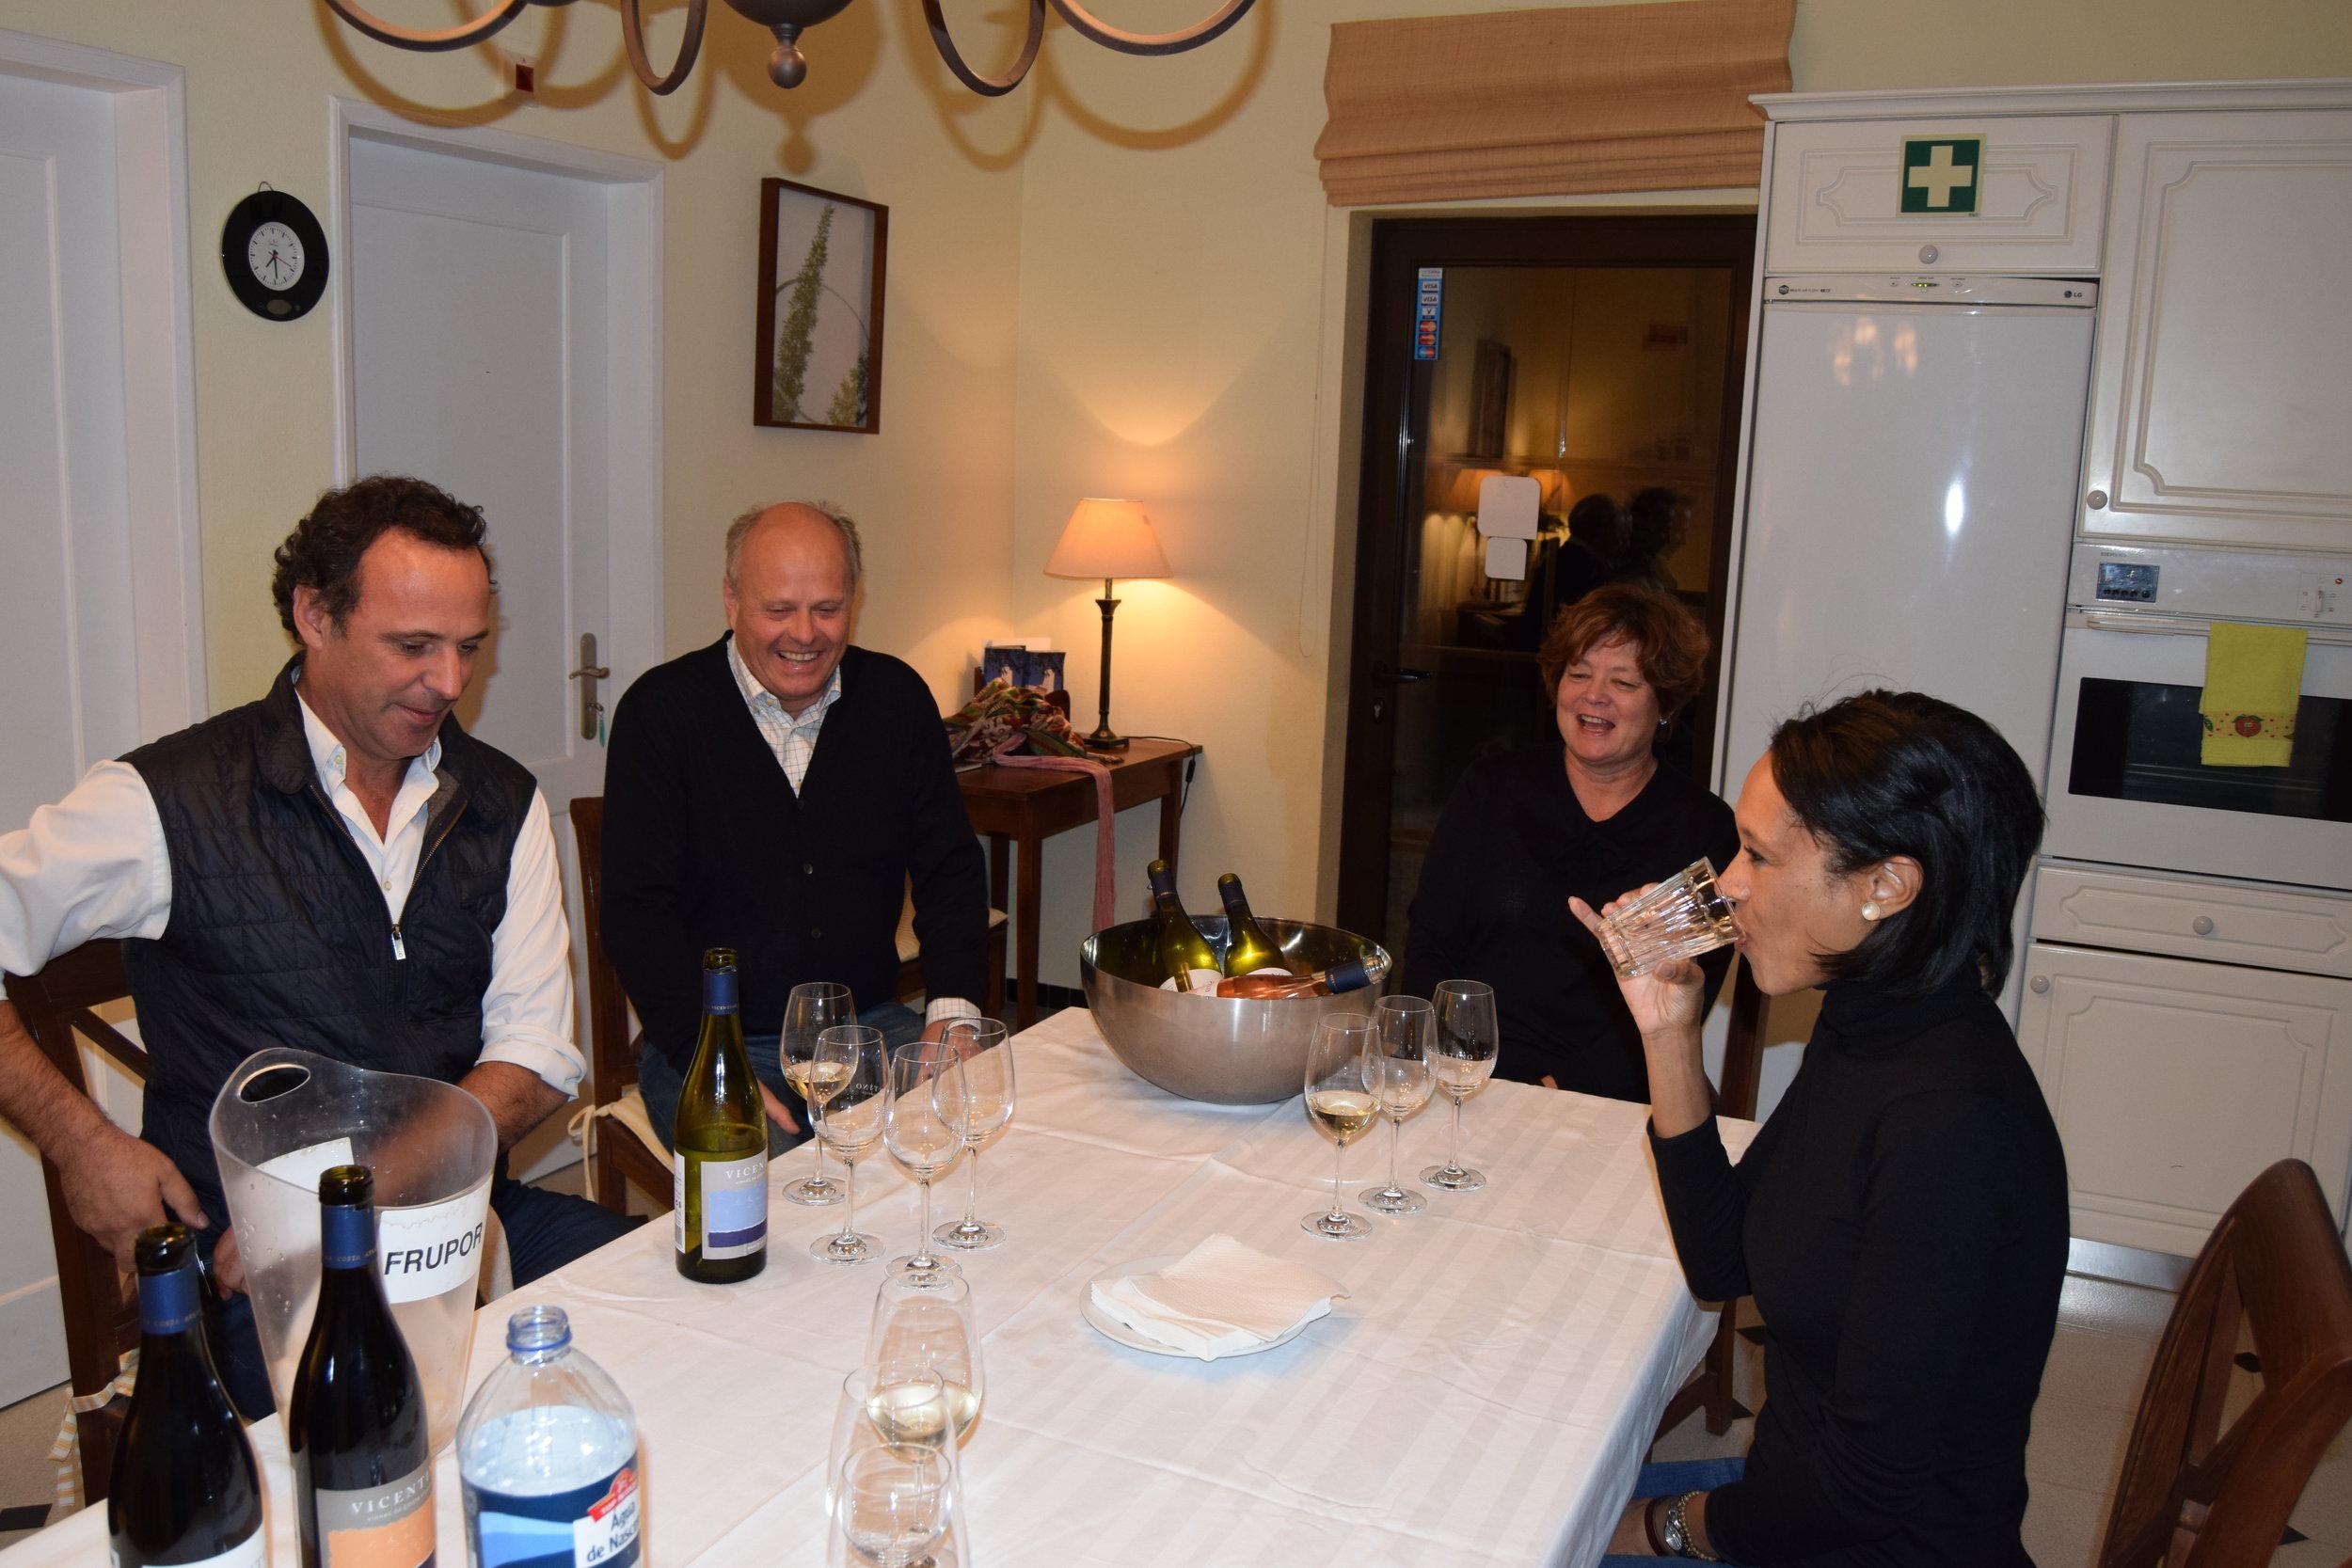 Winemaker bernardo cabral with mr. & mrs. ole martin siem of herdades da frupor